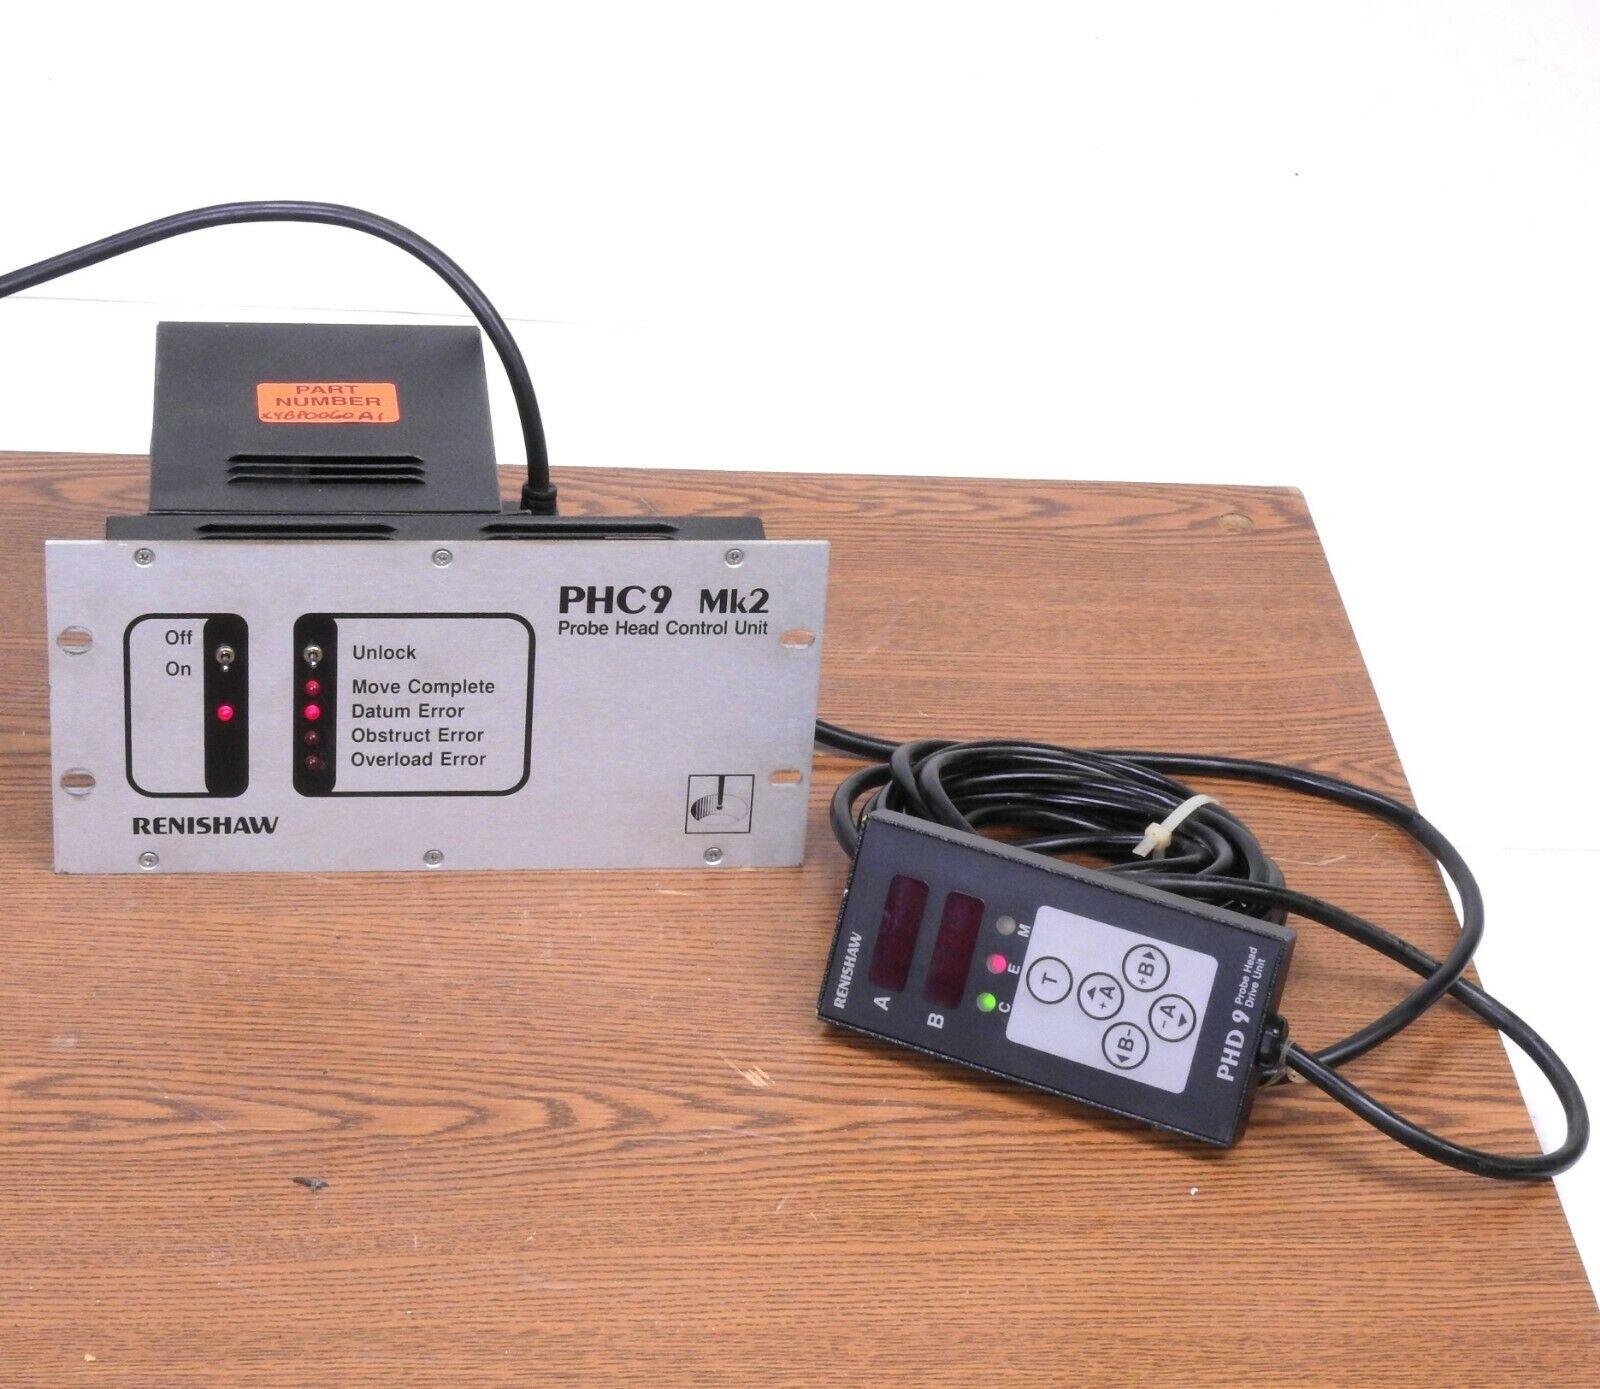 Renishaw PHC9 MK2 Probe Head Control